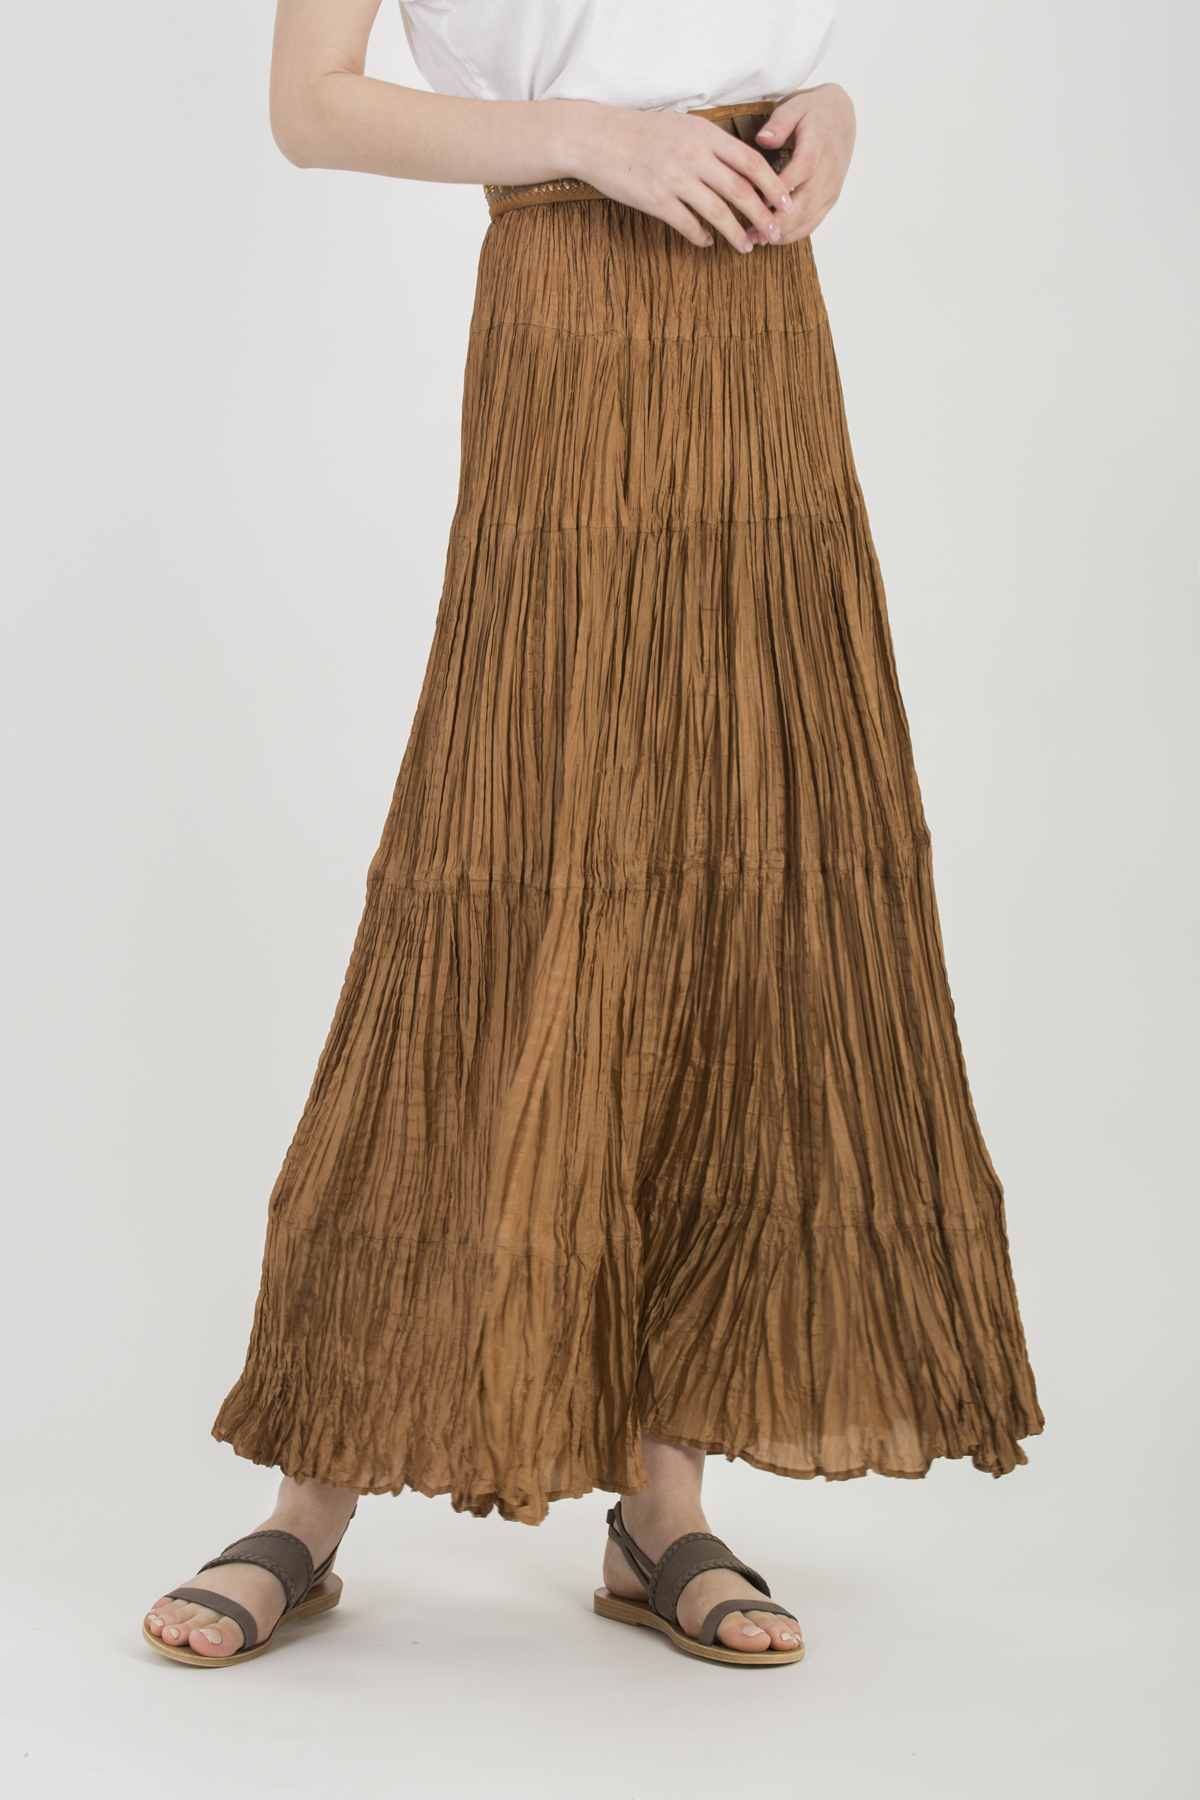 bactriane-skirt-mesdemoiselles-creased-silk-bronze-matchboxathens